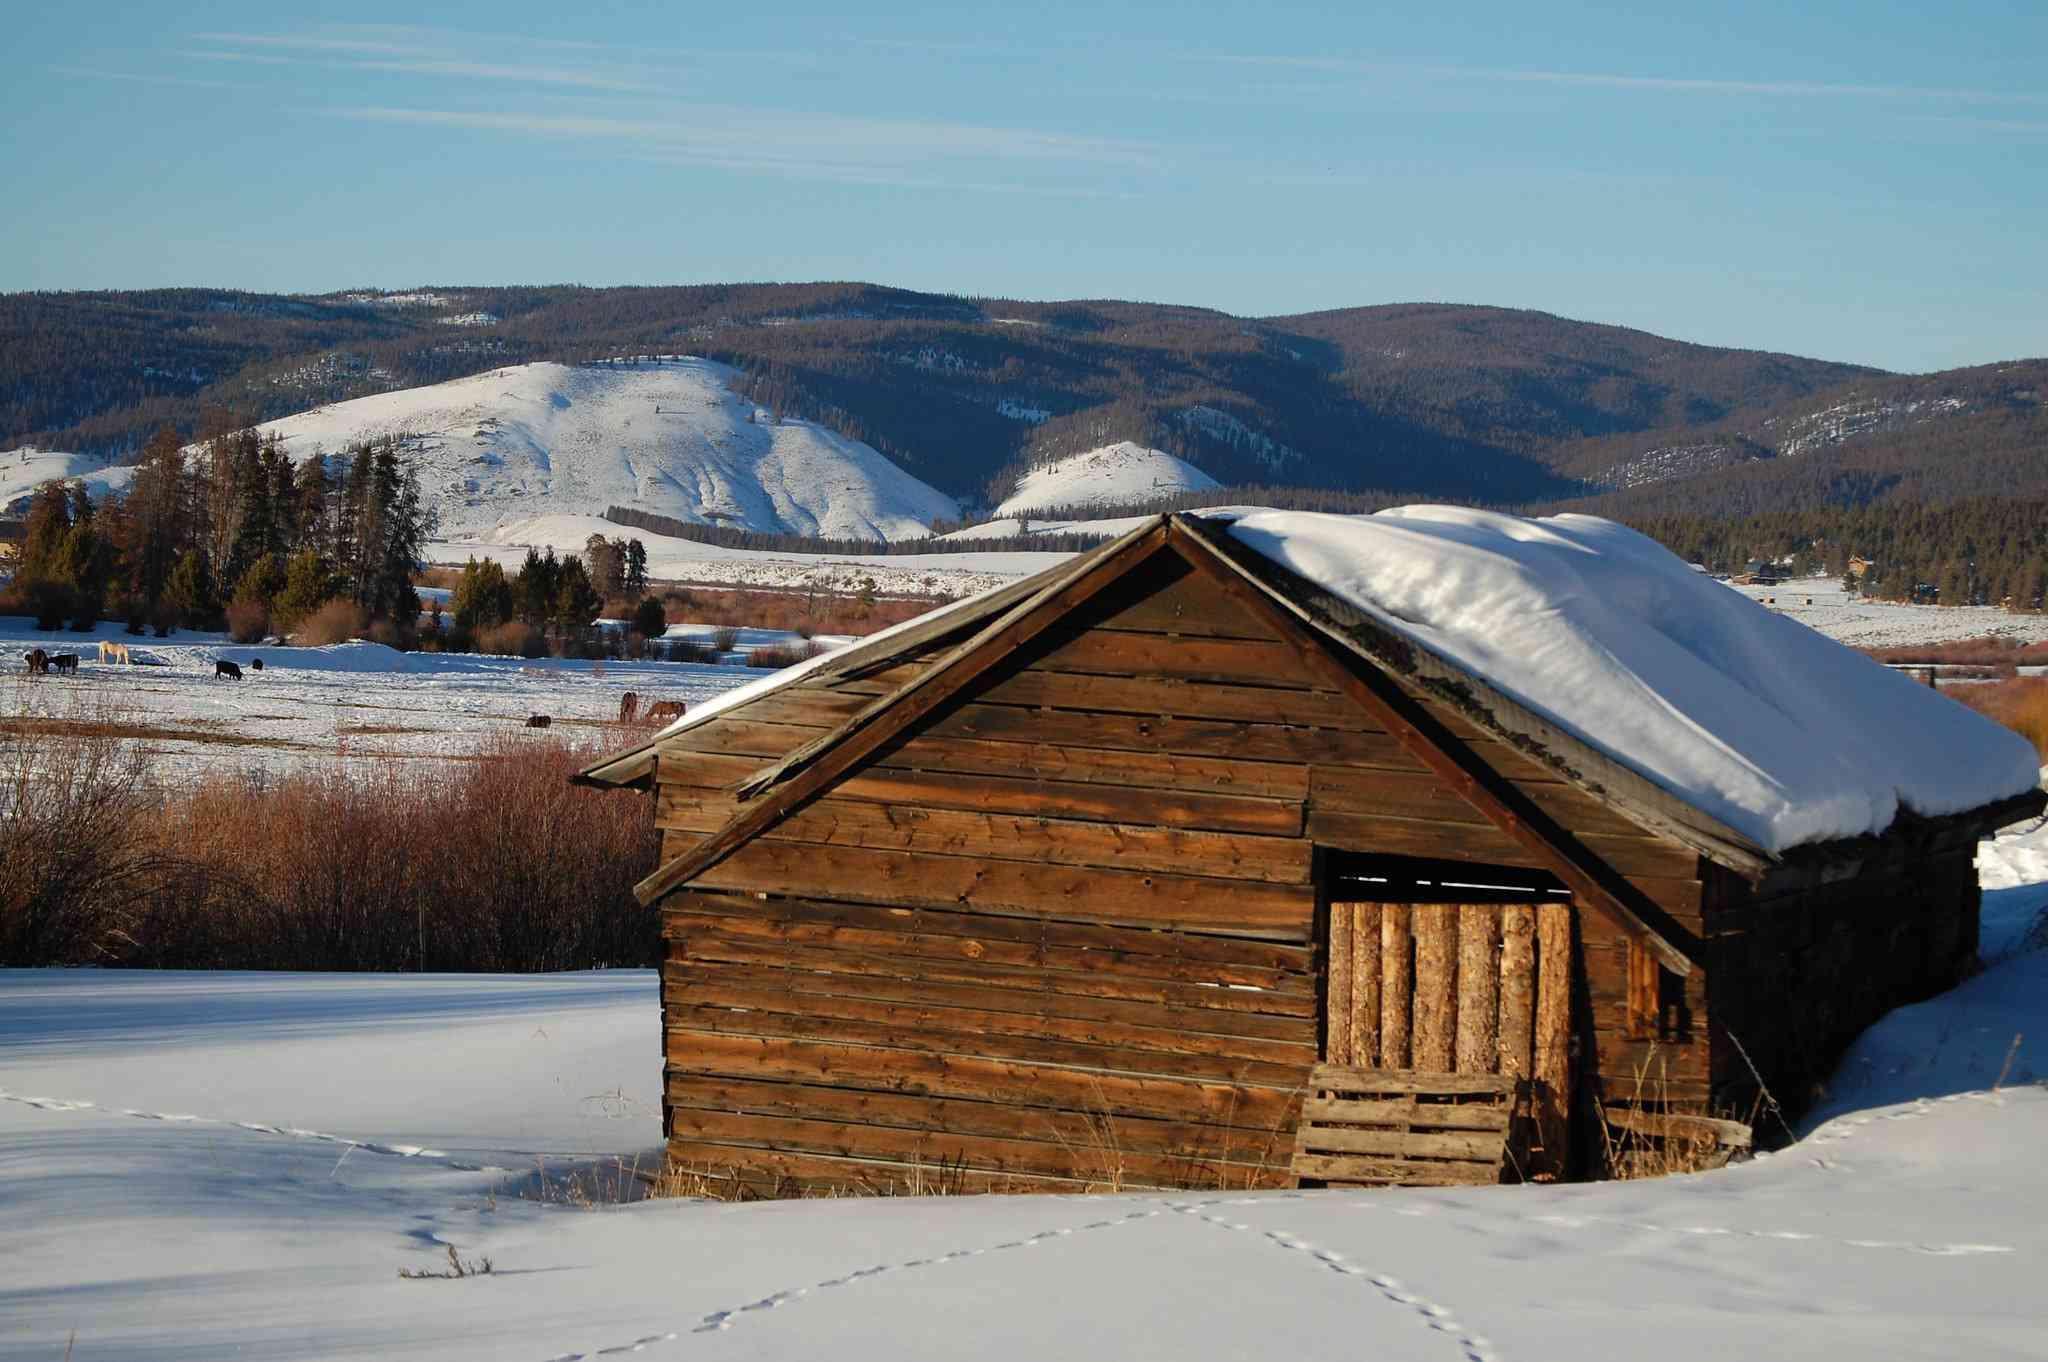 Snow-covered cabin in Fraser, Colorado